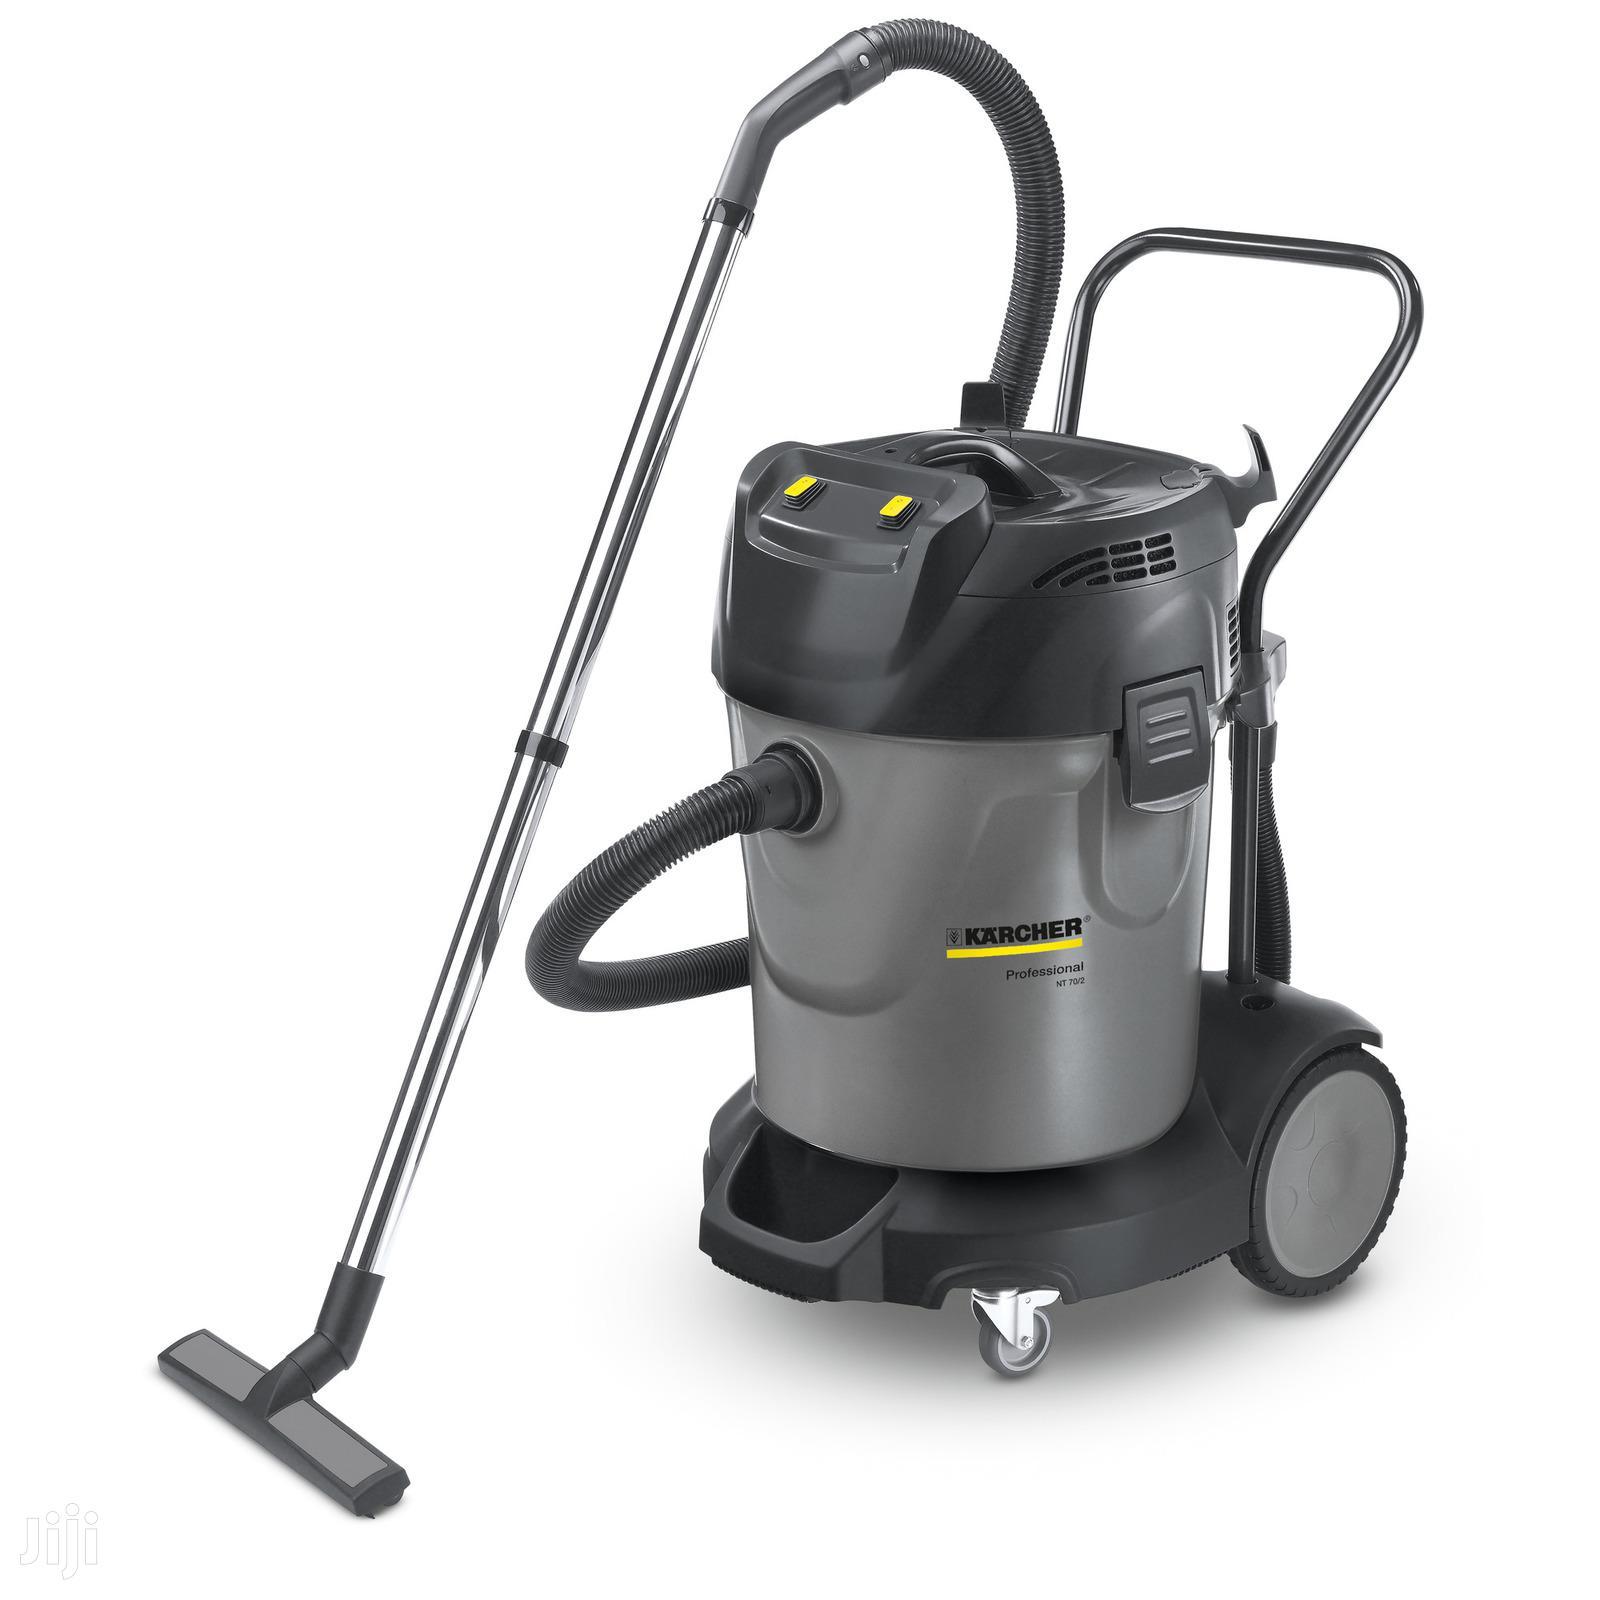 70L Karcher Wet & Dry Vacuum Cleaner